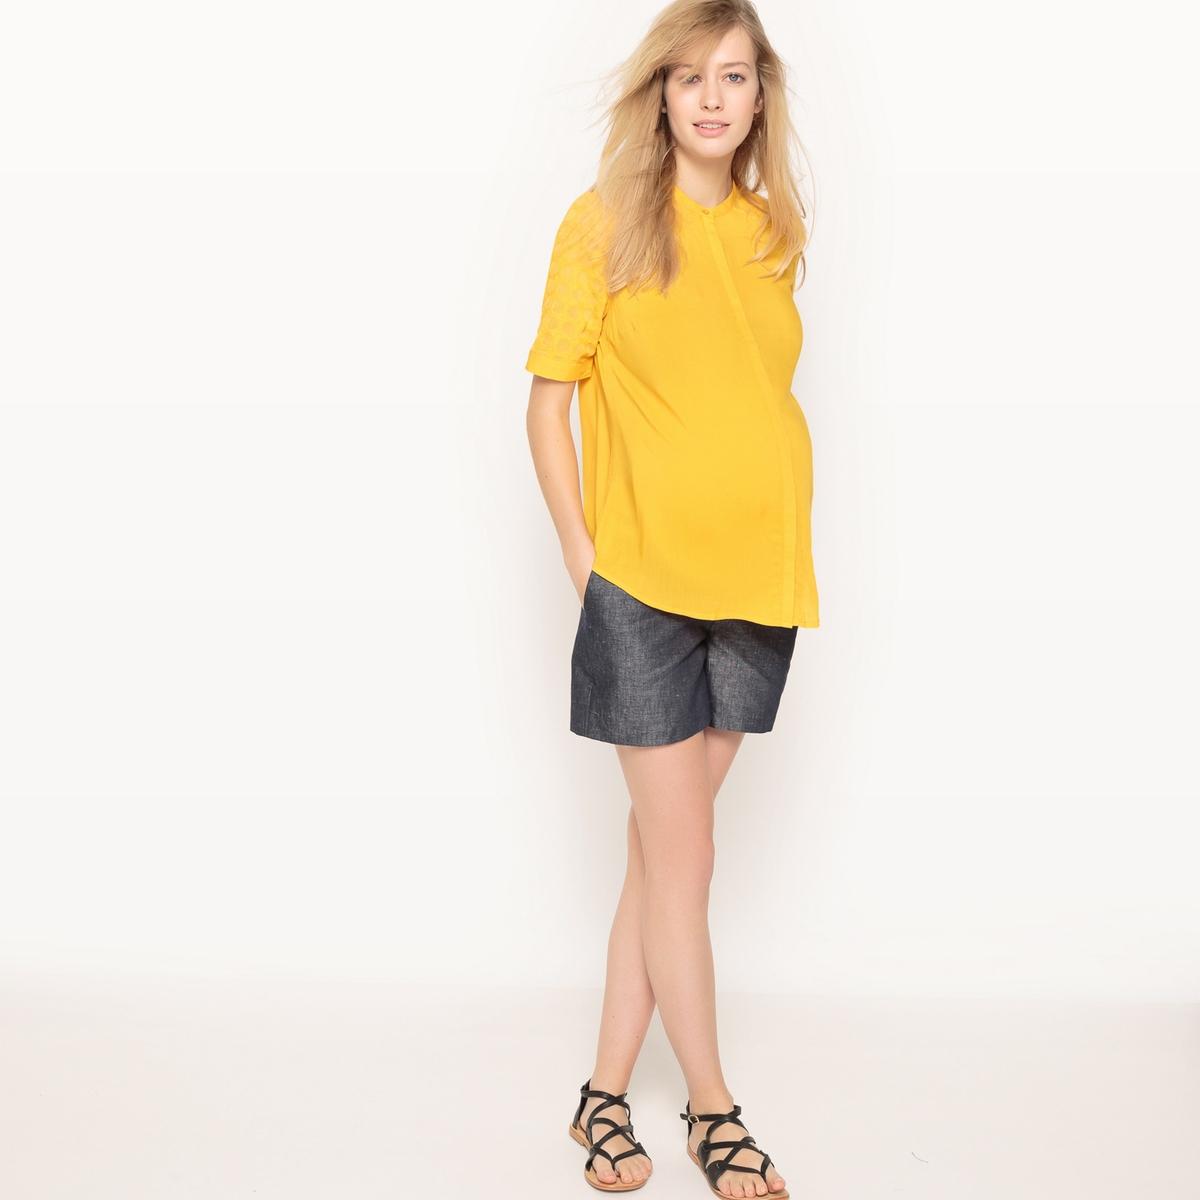 Camisa direita para grávida